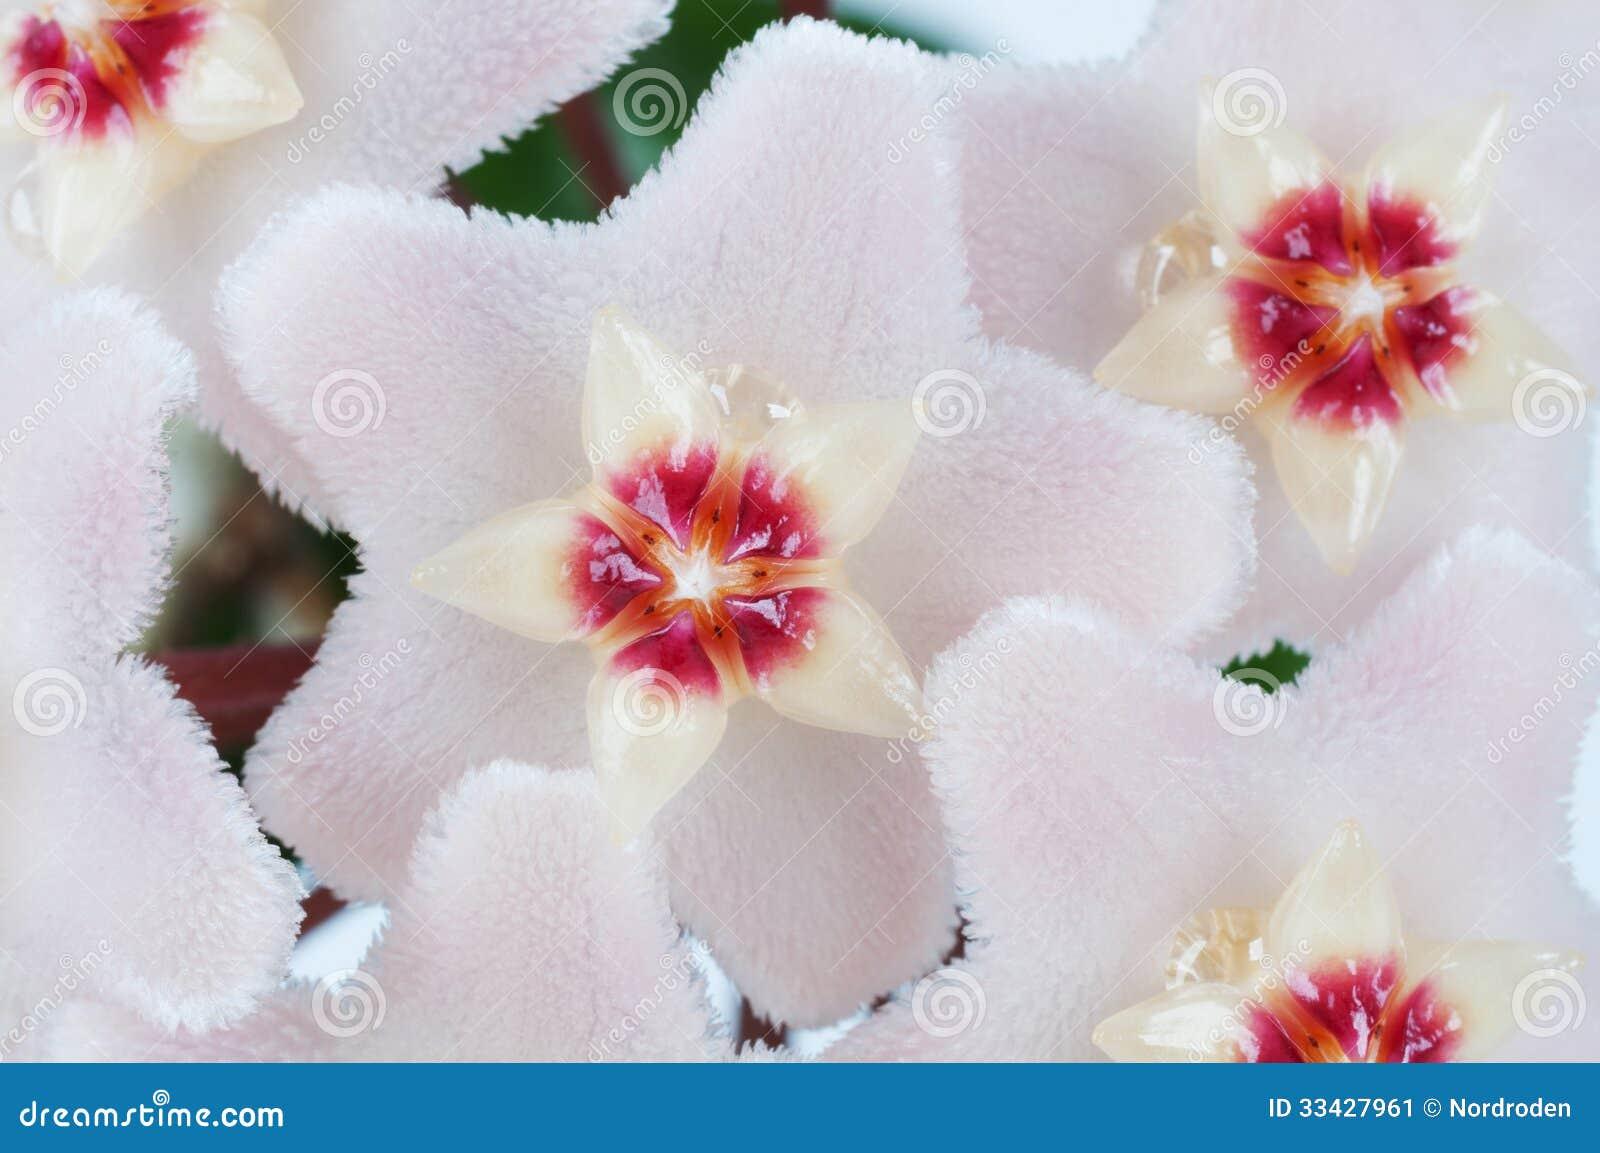 Hoya flowers macro